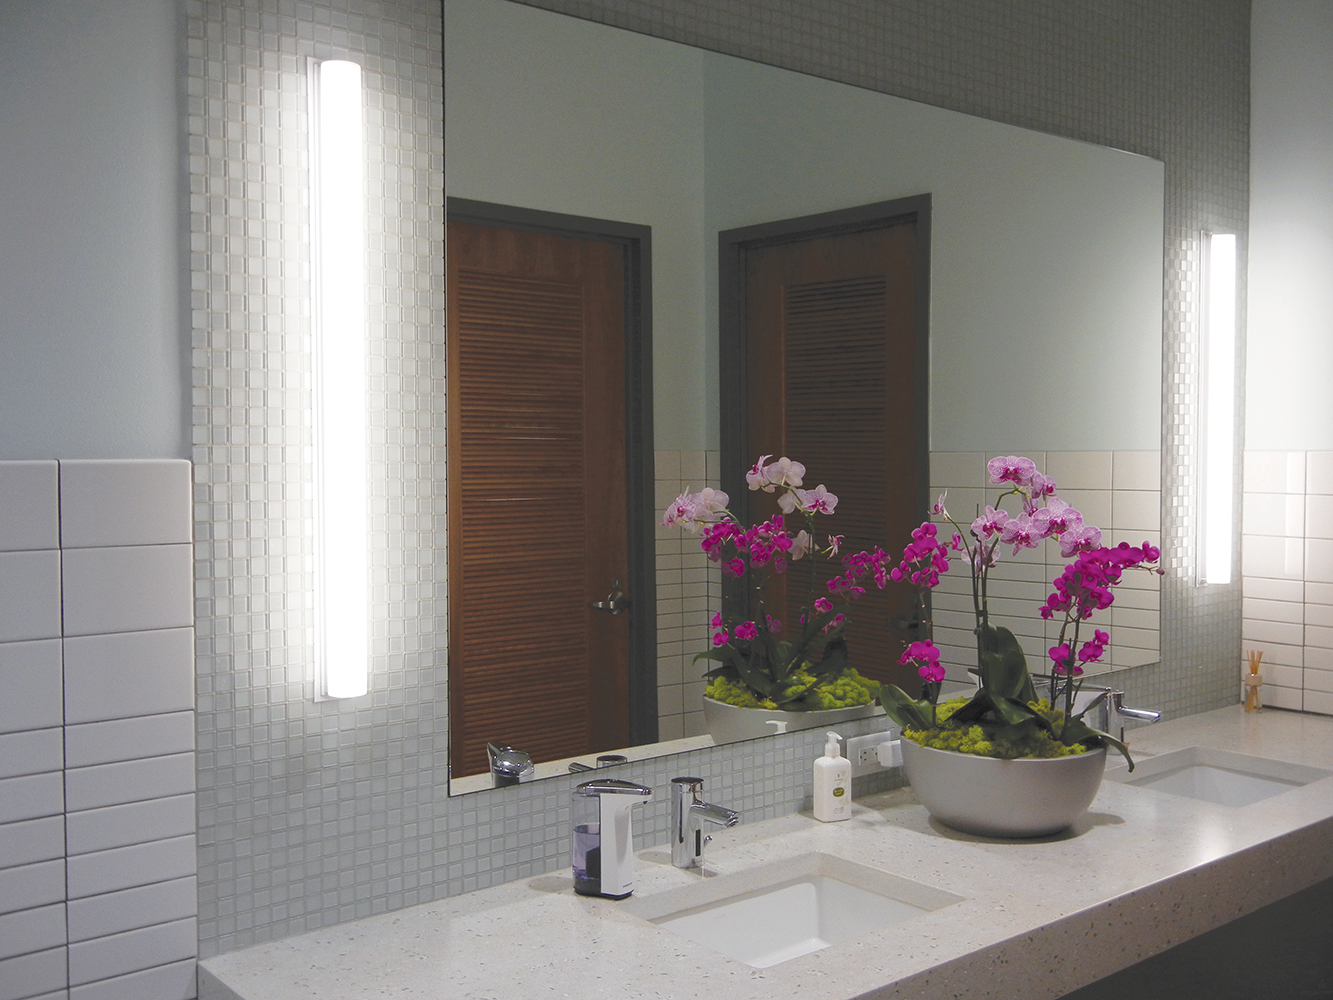 Voila modern vanity light fixtures illuminate mirrors in sleek, clean restroom with a bowl of purple flowers between two sinks.